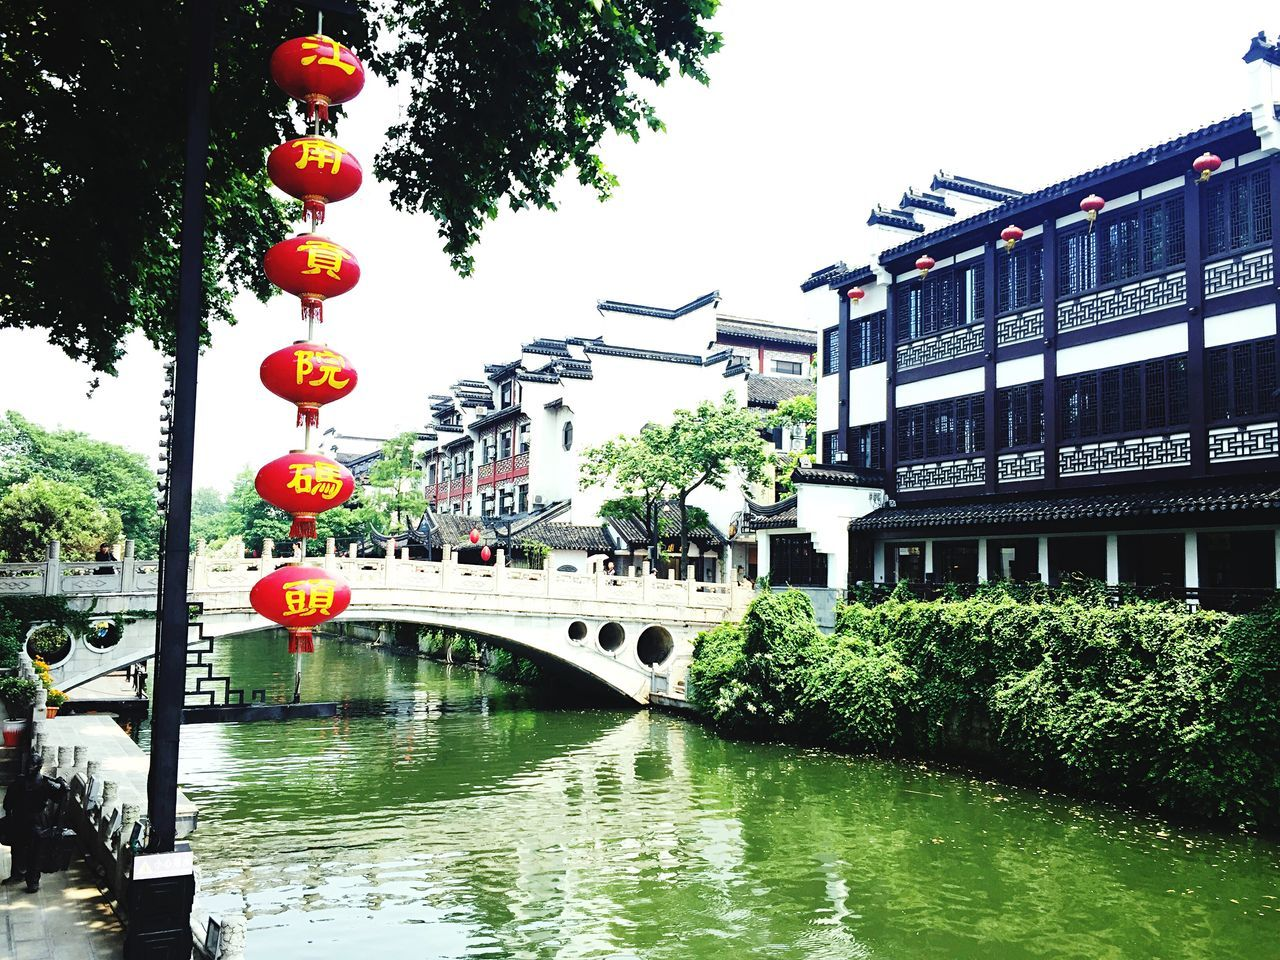 The Great Outdoors - 2016 EyeEm Awards Qinhuai River Green River Riverside Bridge